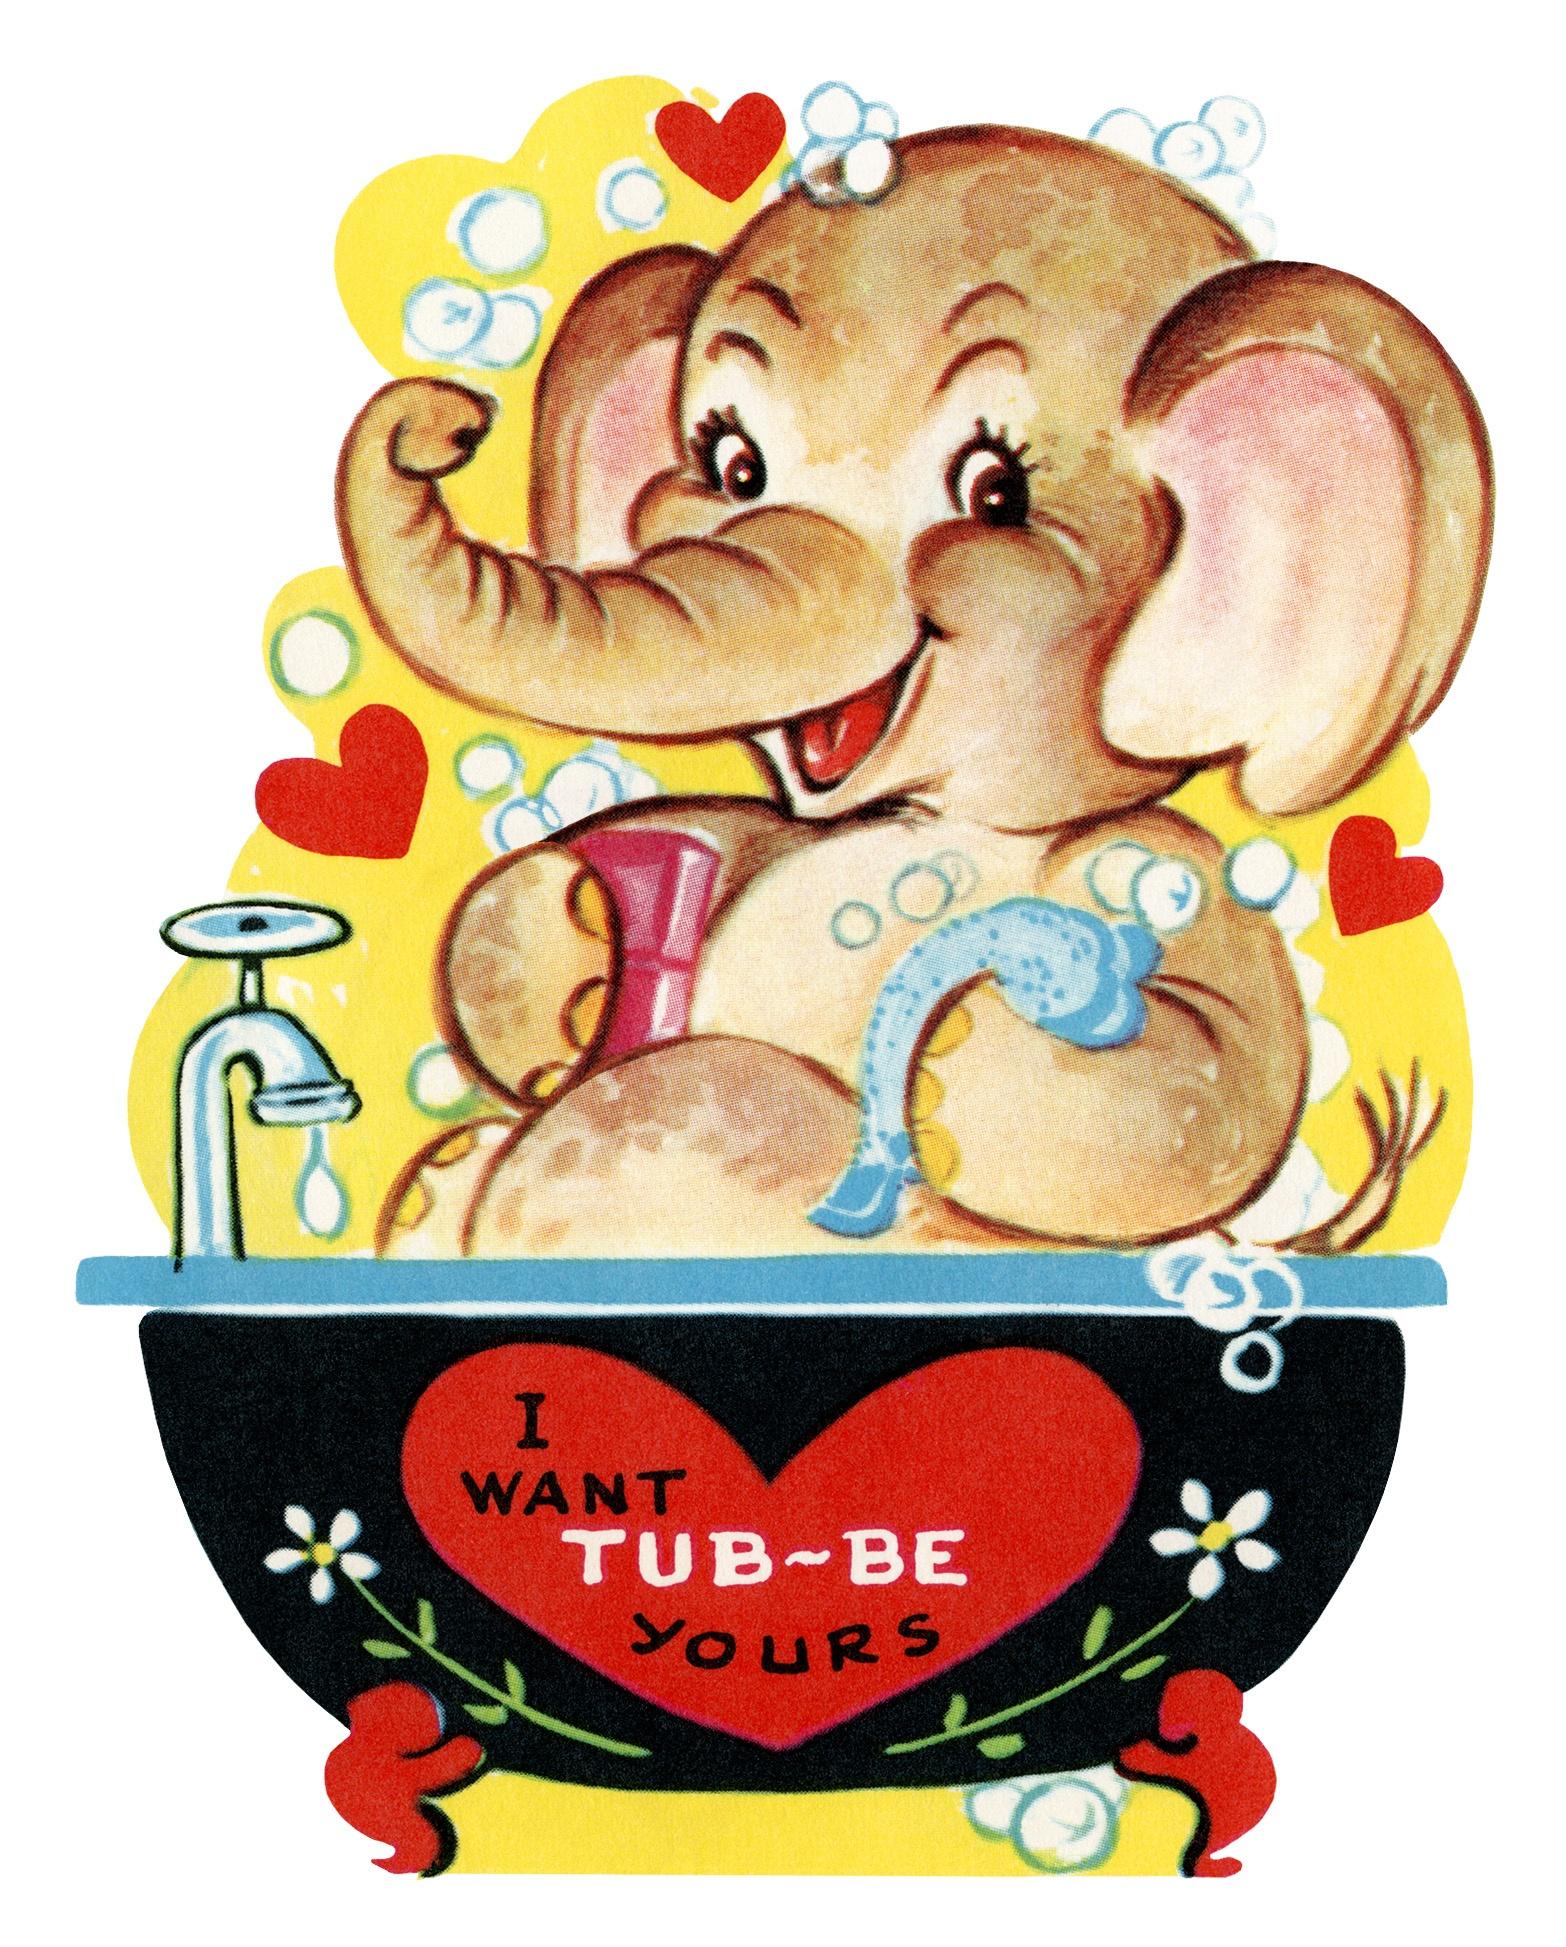 Free Printable Vintage Valentine Elephant In Tub - Old Design Shop Blog - Free Printable Vintage Valentine Clip Art